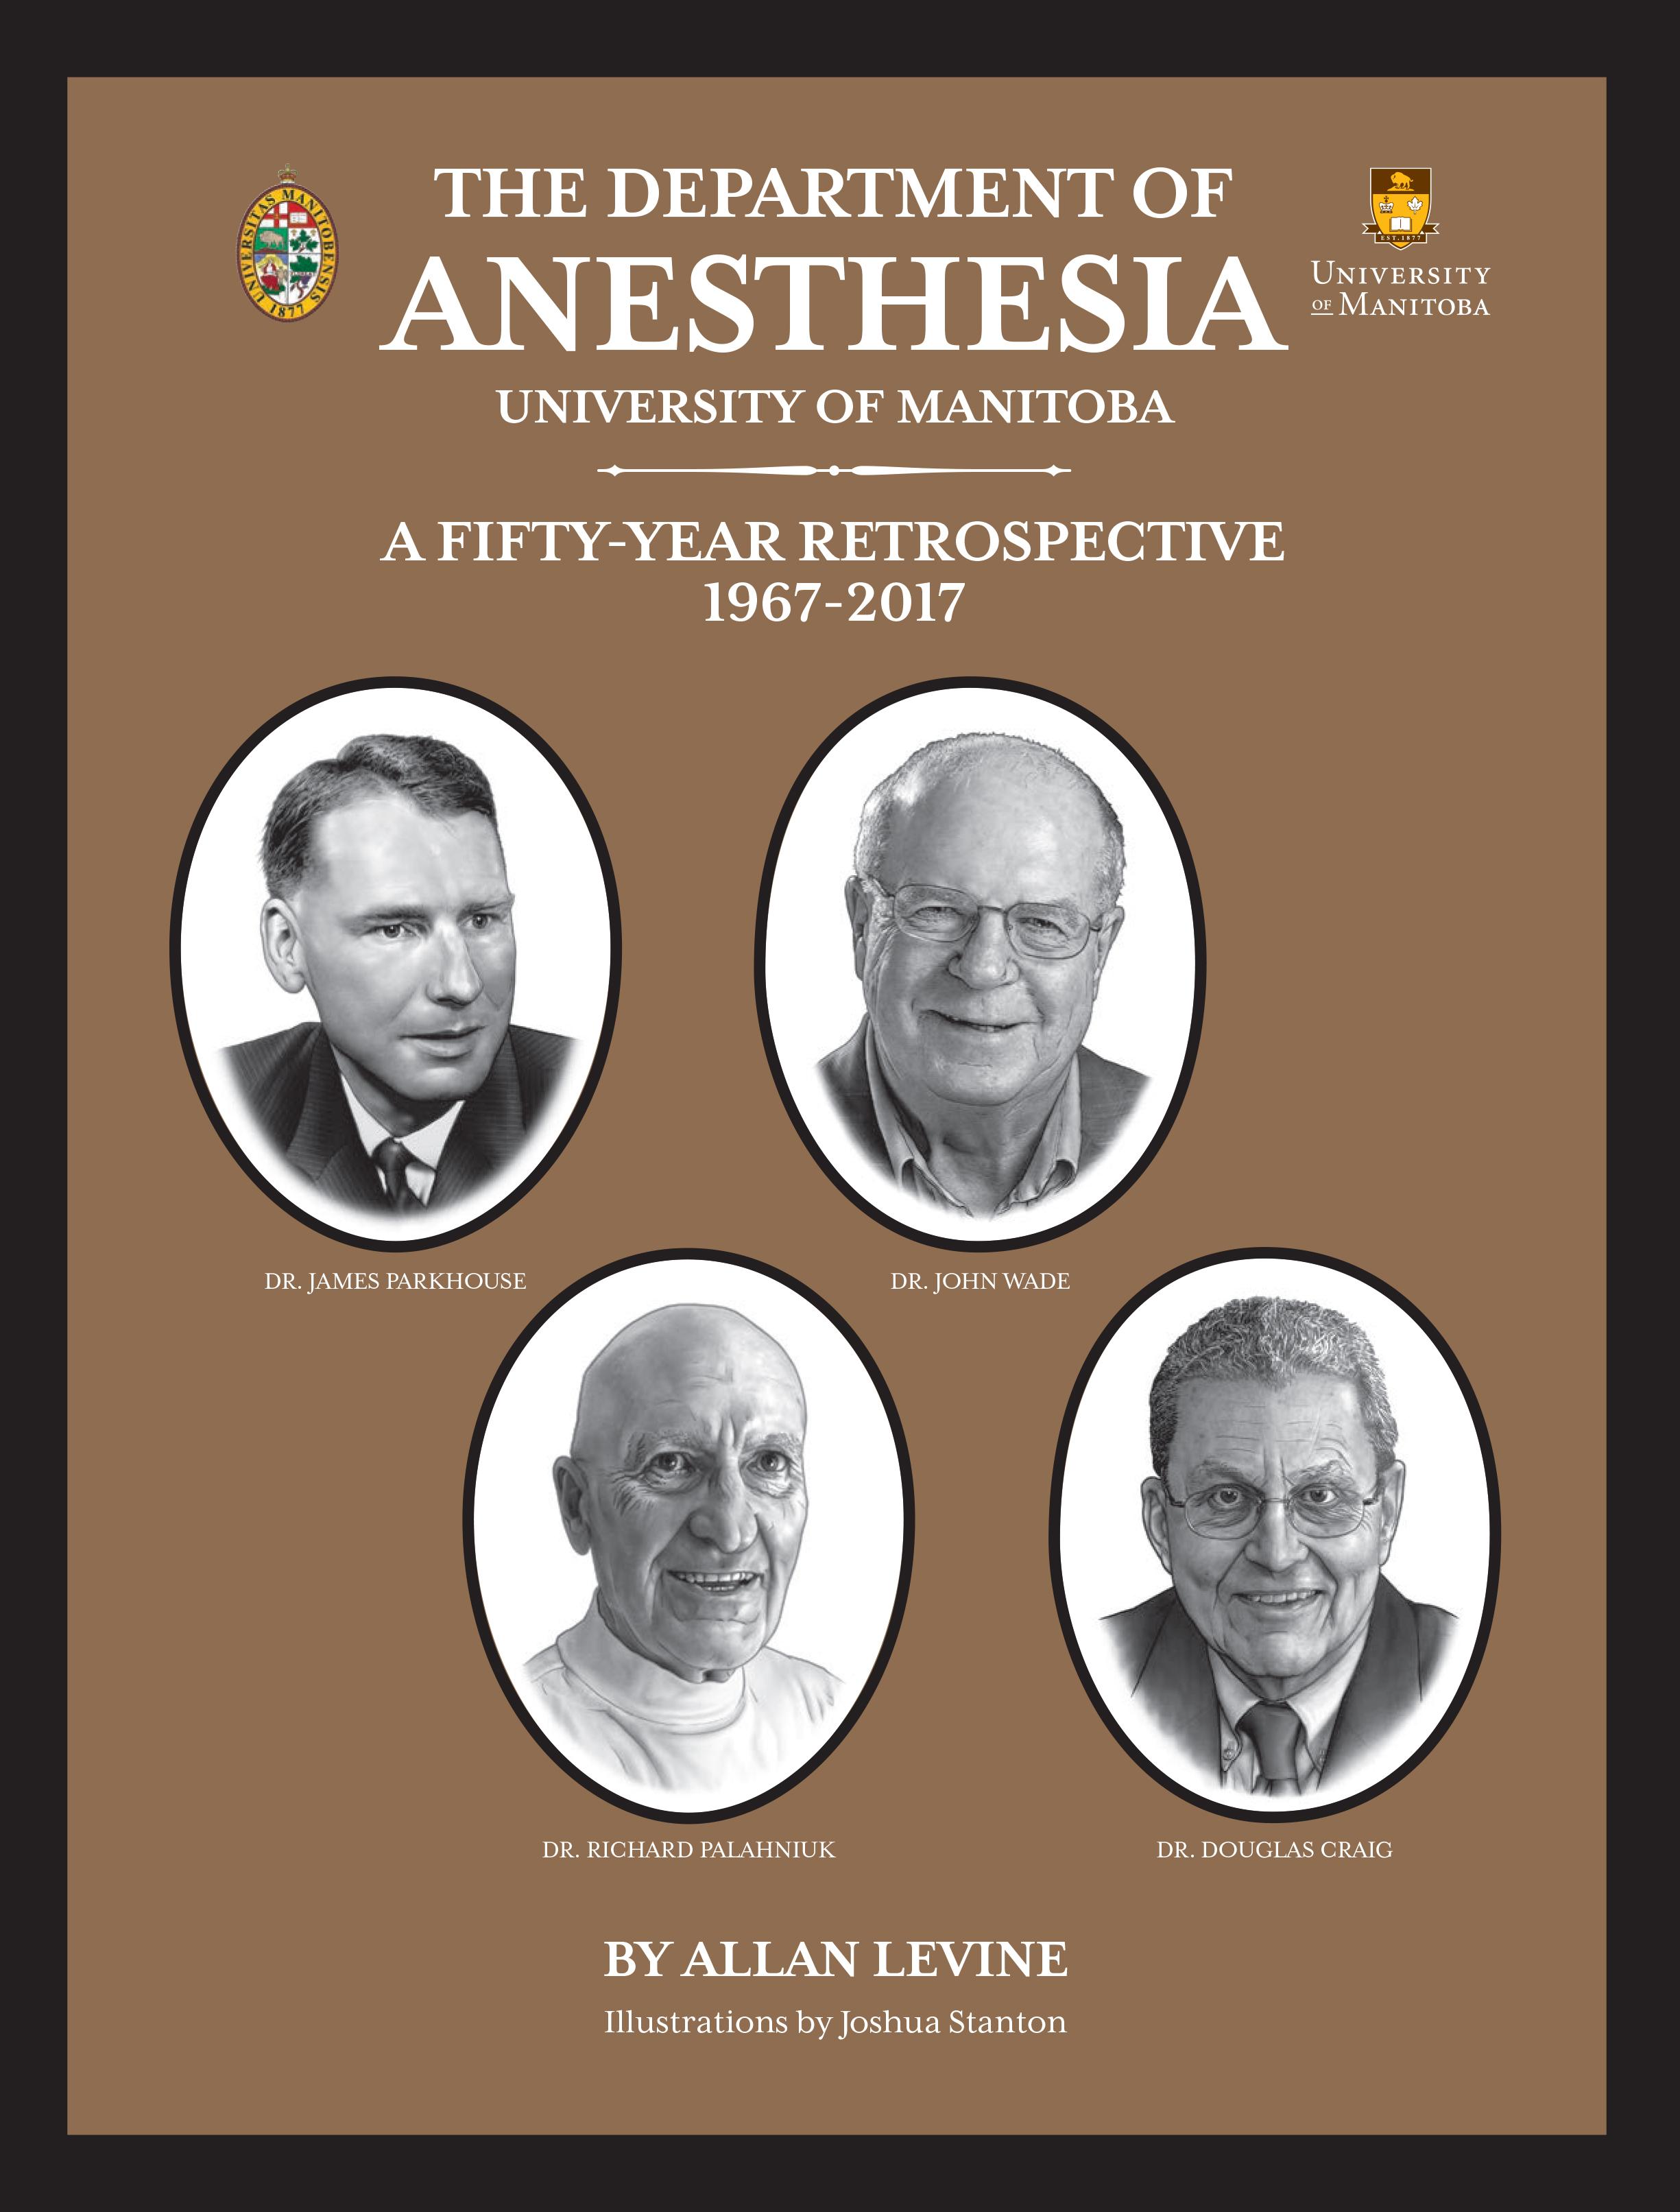 Cover-Anesthesia-UofMfinal.jpg